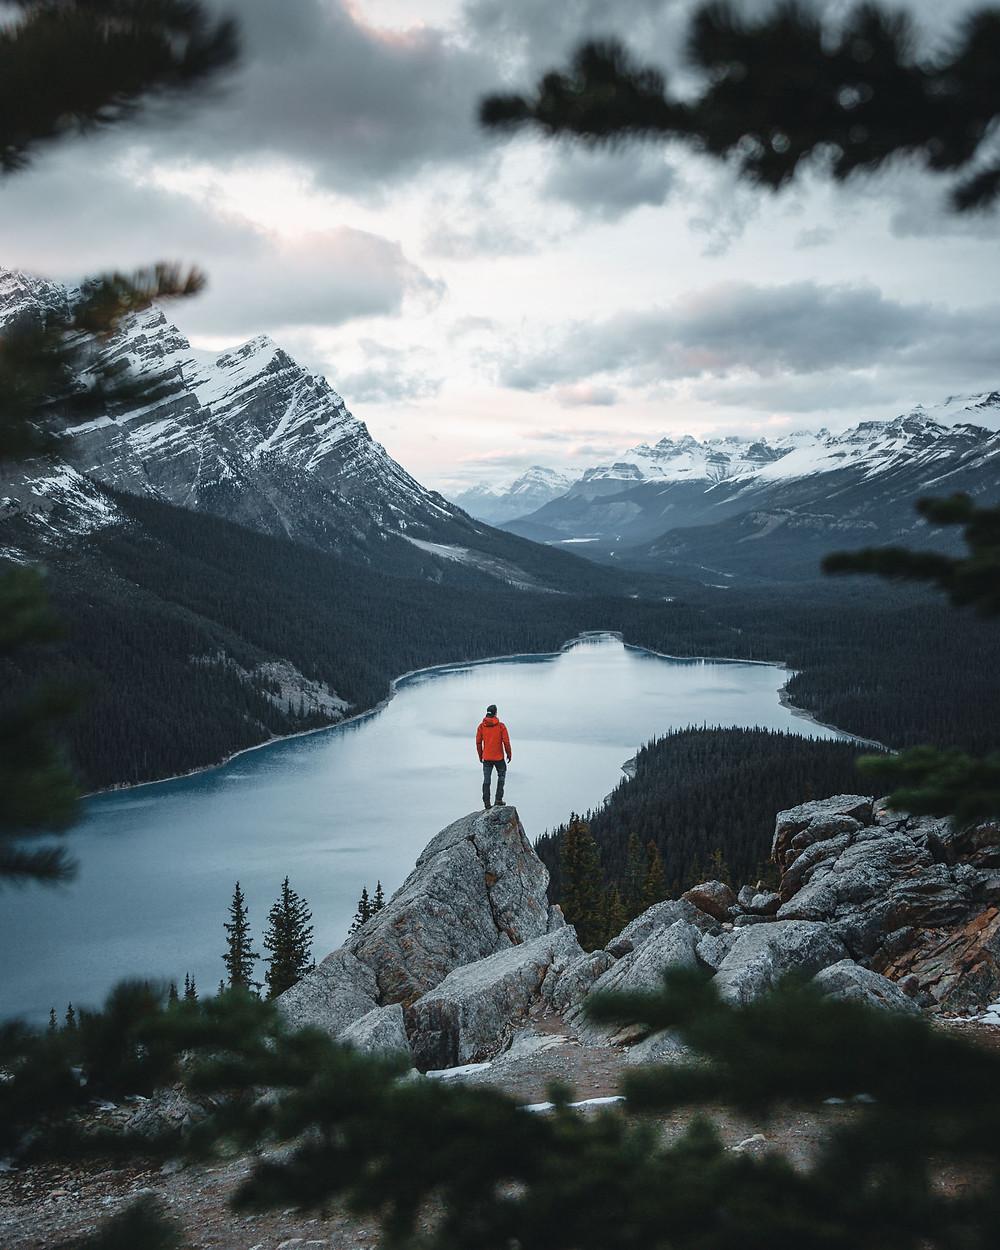 Peyto Lake, Abenteuer, Wandern, Blog, Instagram, Canada, Kanada, Route, Photography, Fotografie, Reisen